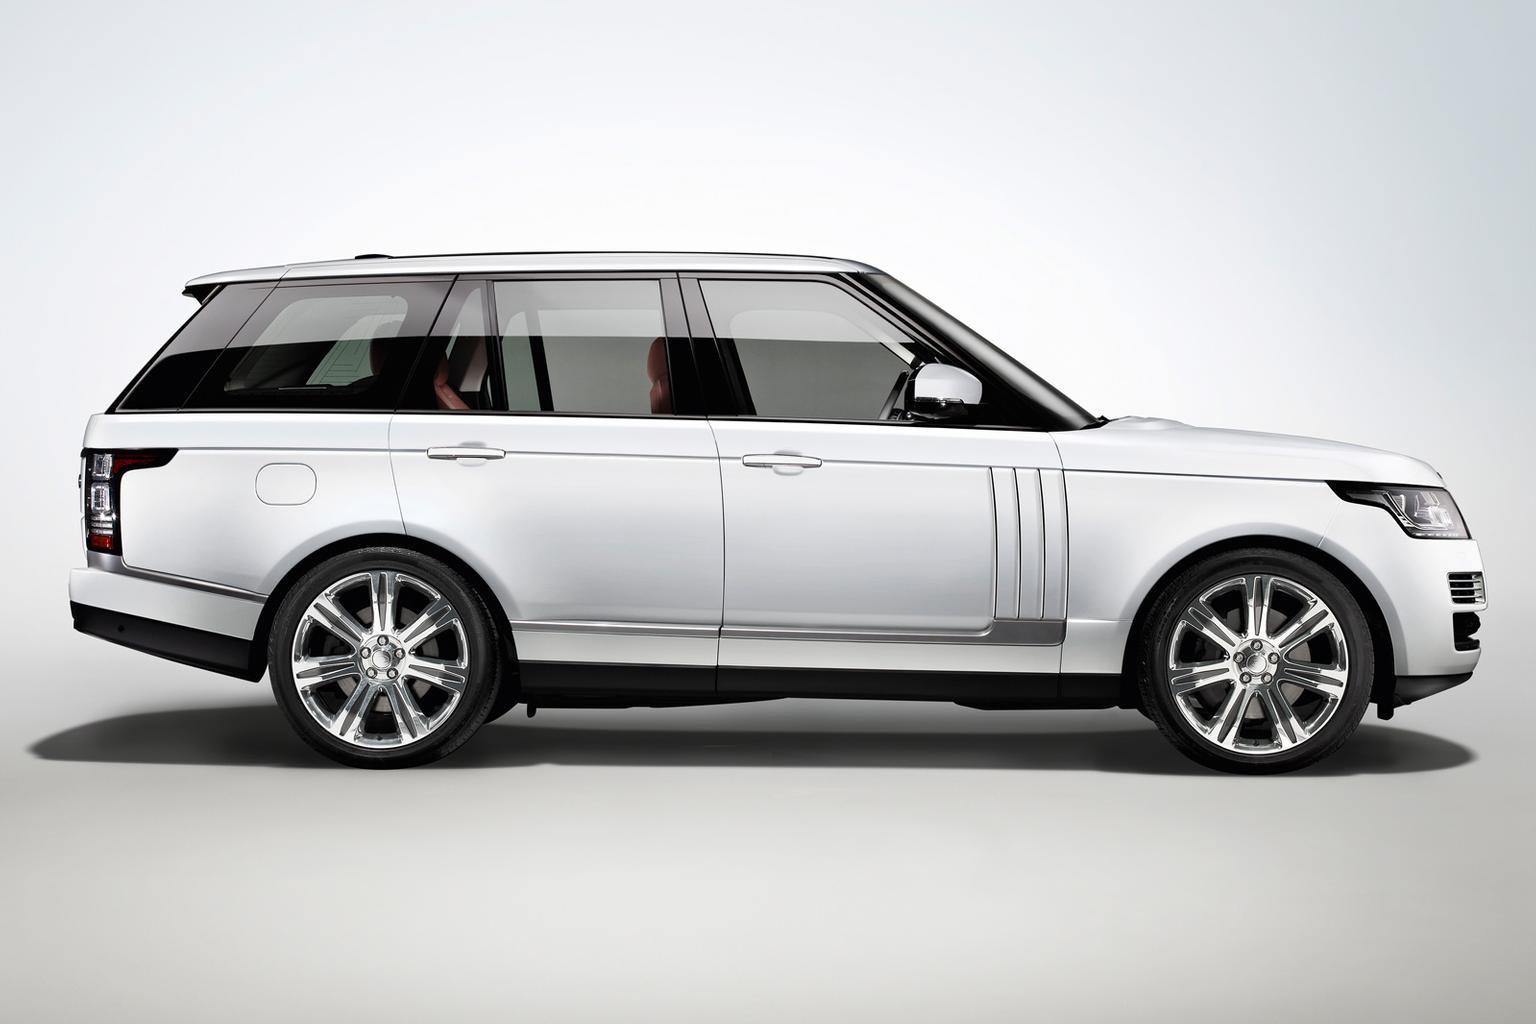 2014 Range Rover Long Wheelbase revealed